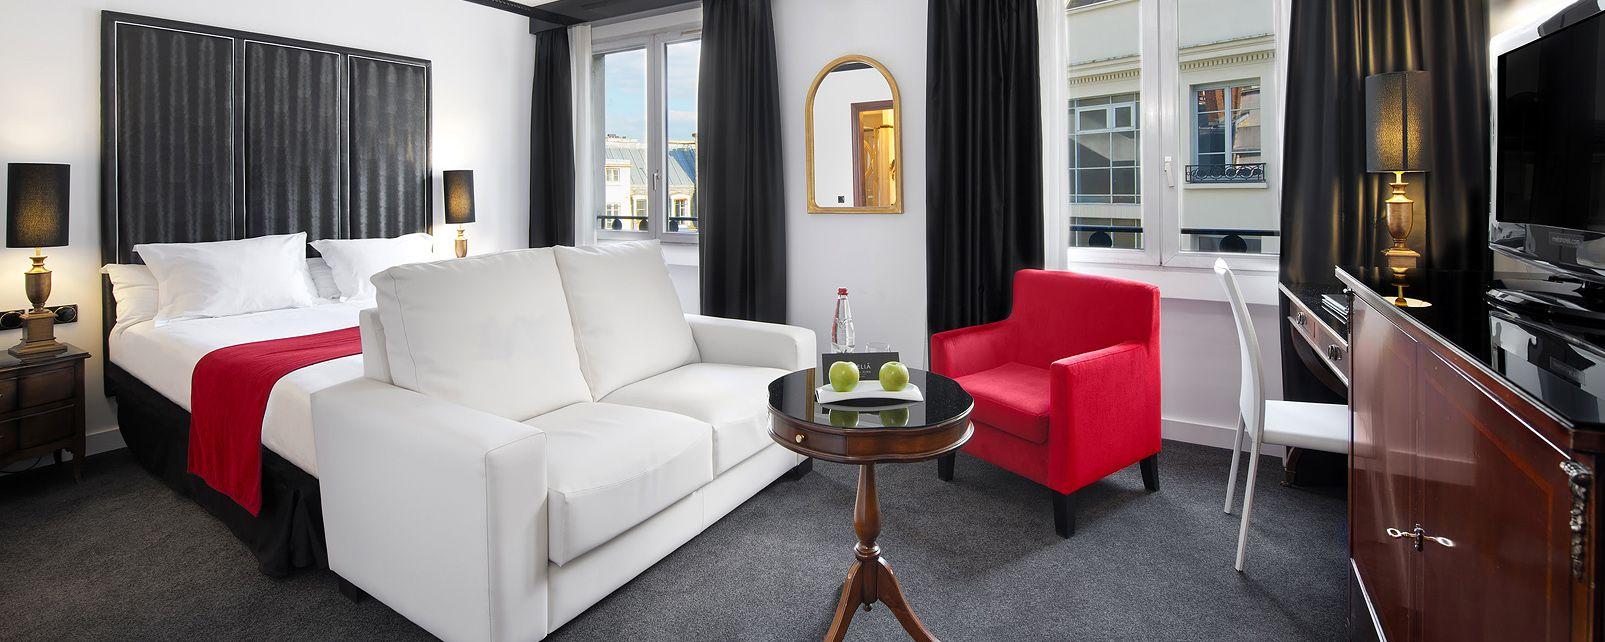 Melia Royal Alma (París, Francia) - Hotel